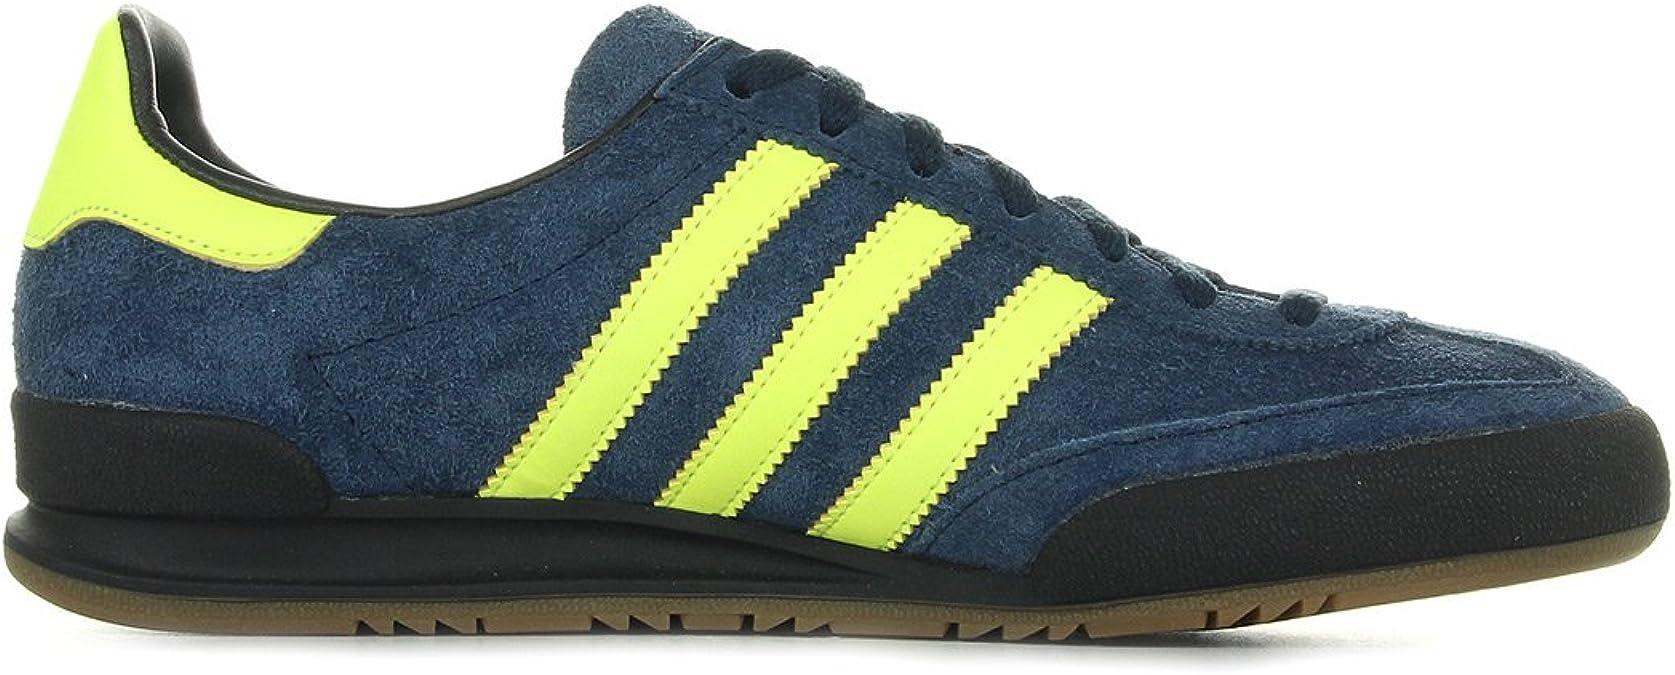 adidas Jeans CG3243 Mens Trainers UK 4.5: Amazon.co.uk